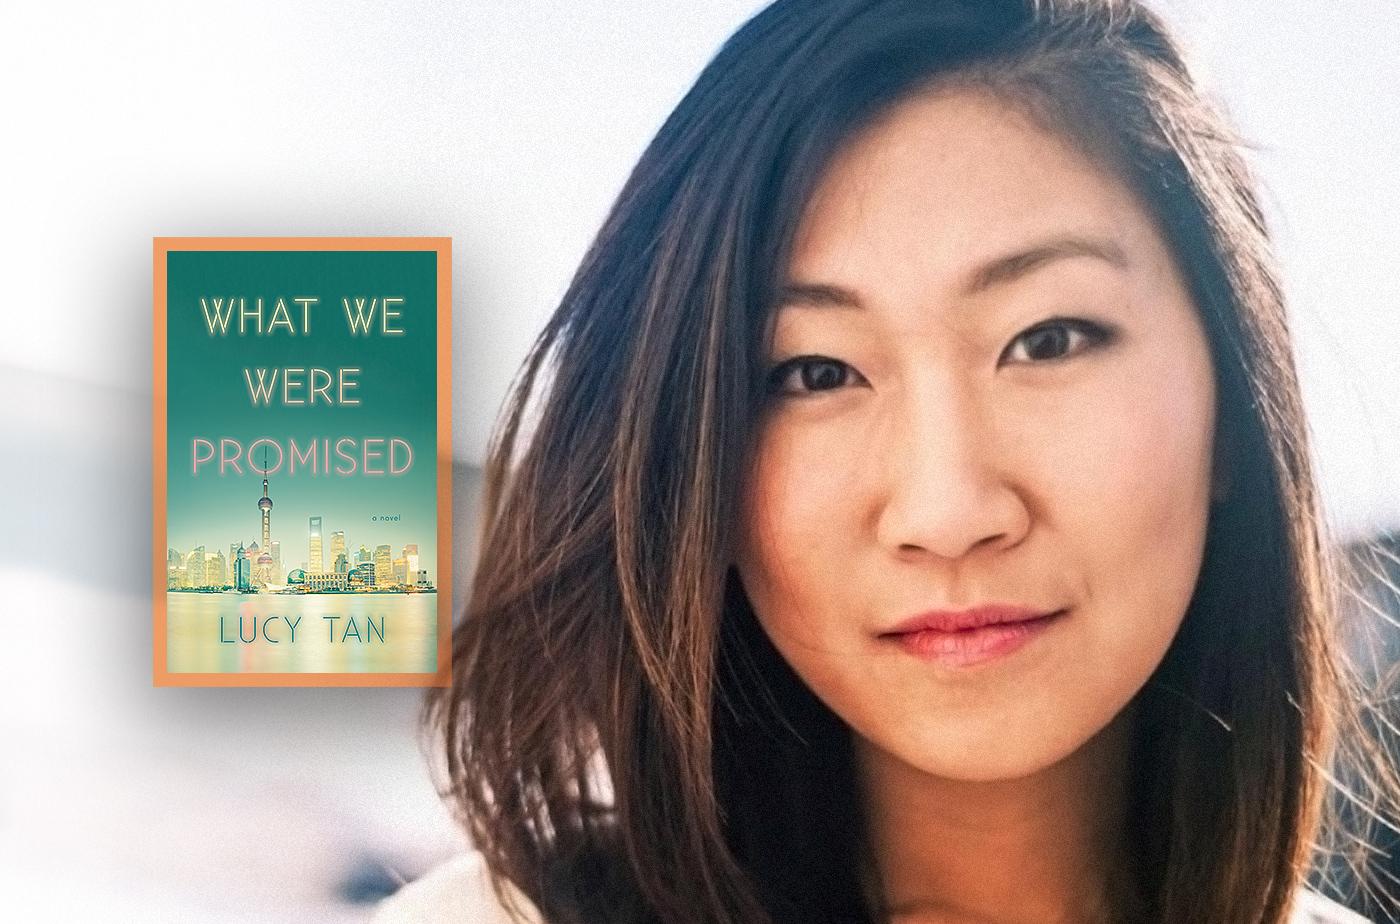 Catapult  classes: Lucy Tan, 8-Week Novel Writing Workshop, Fiction, Workshop